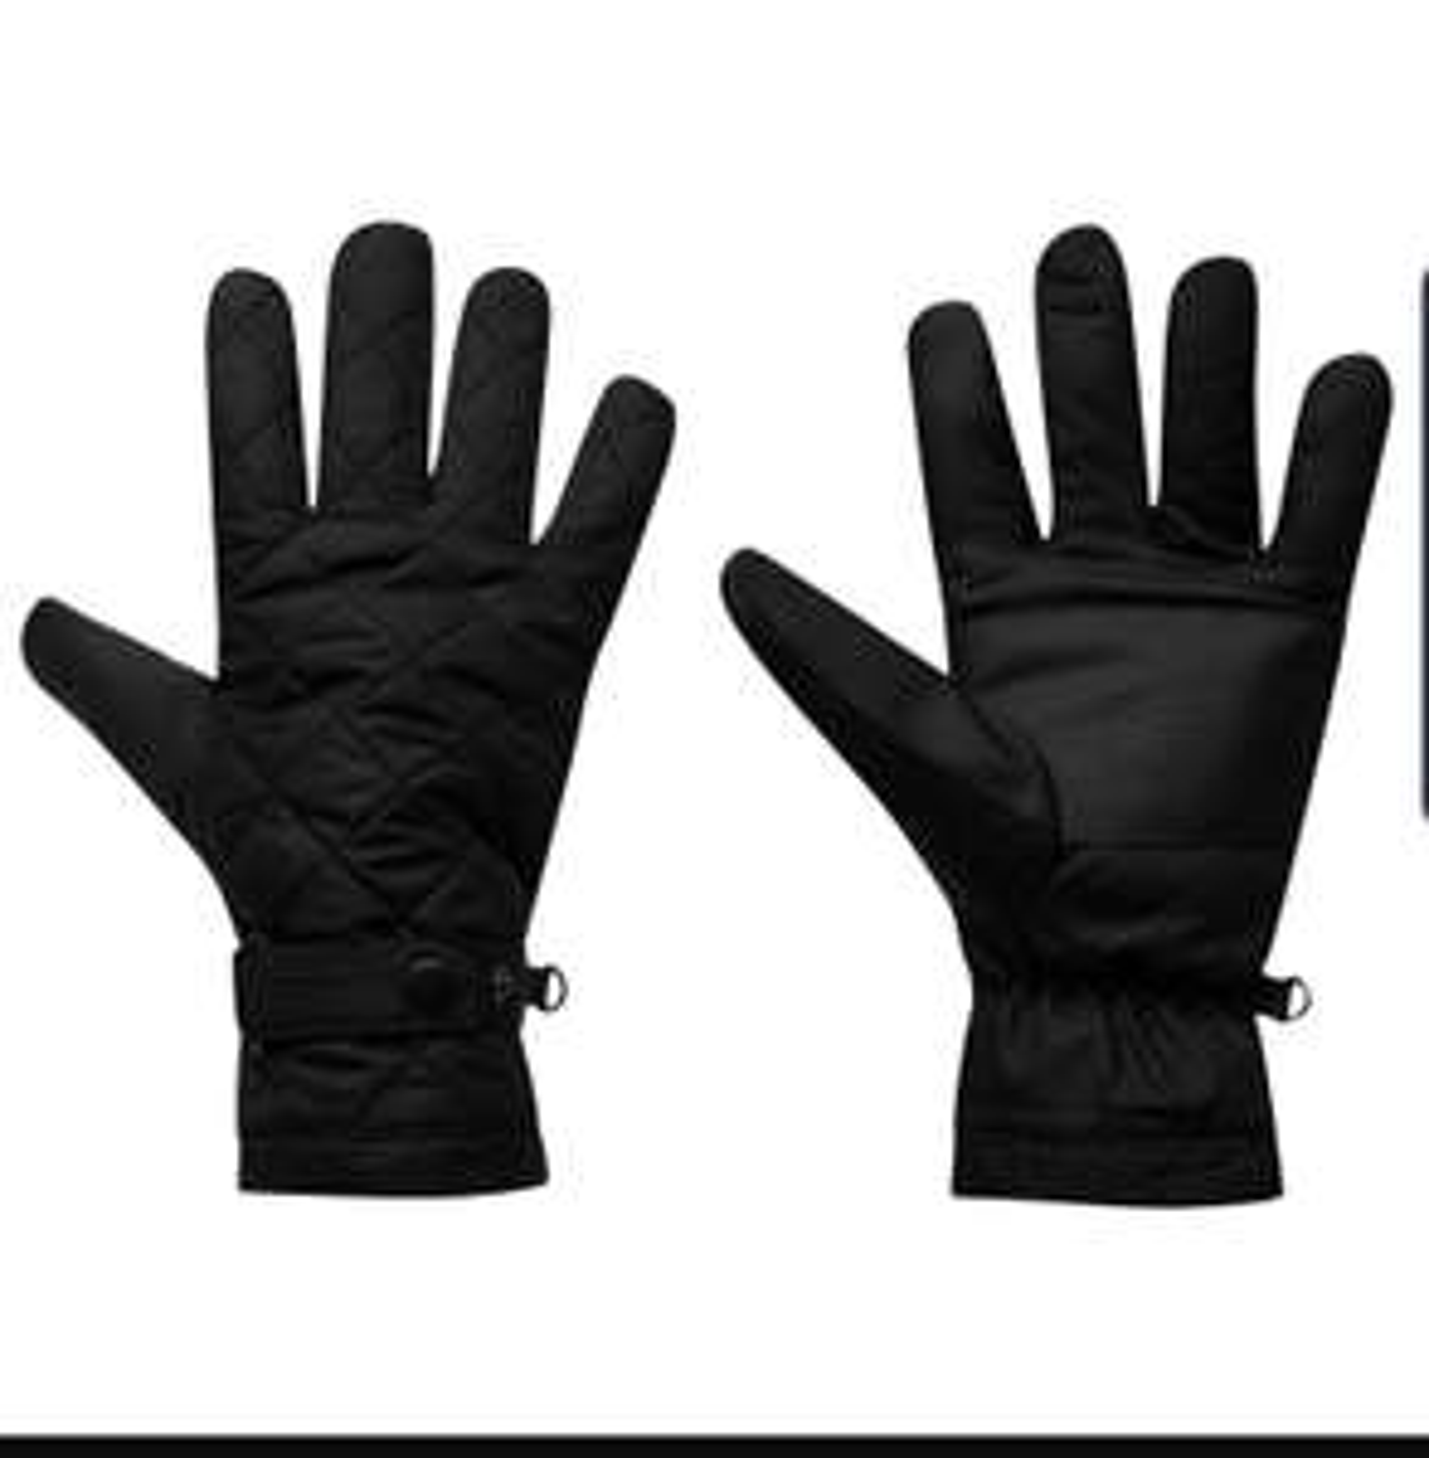 Firetrap Geyser Gloves, only small/medium £2 available Click & Collect £4.99 + u get £10 voucher @ House of Fraiser